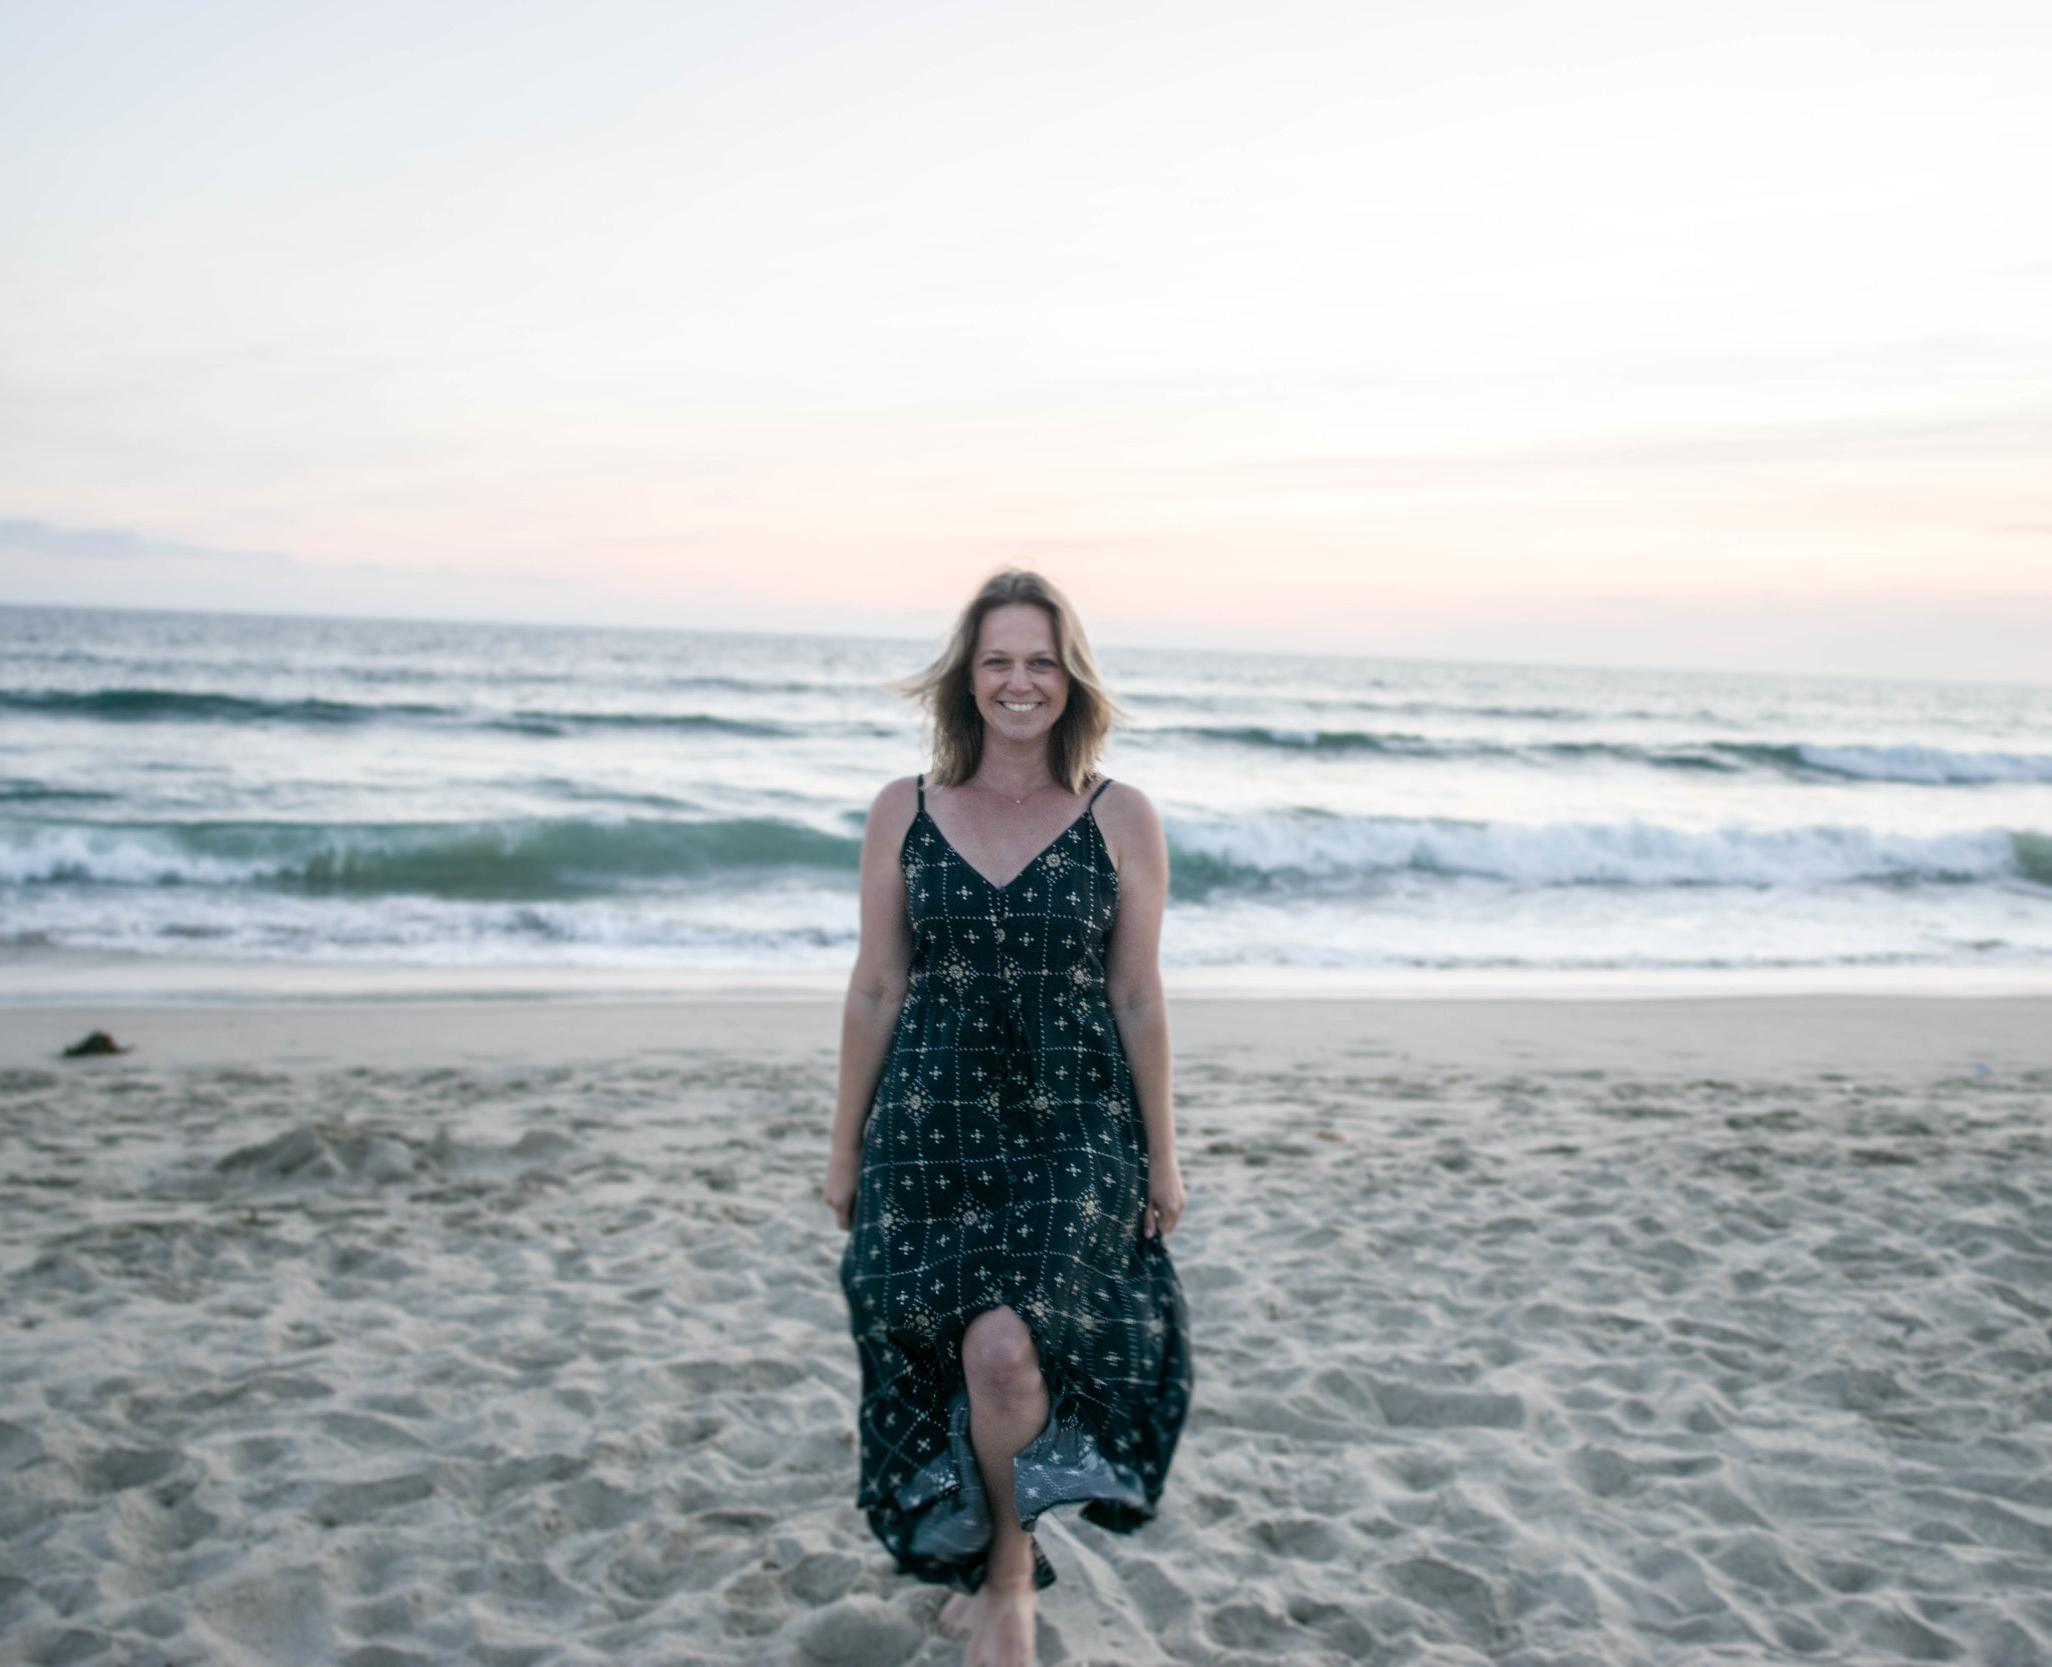 Jill in her element on Venice beach!